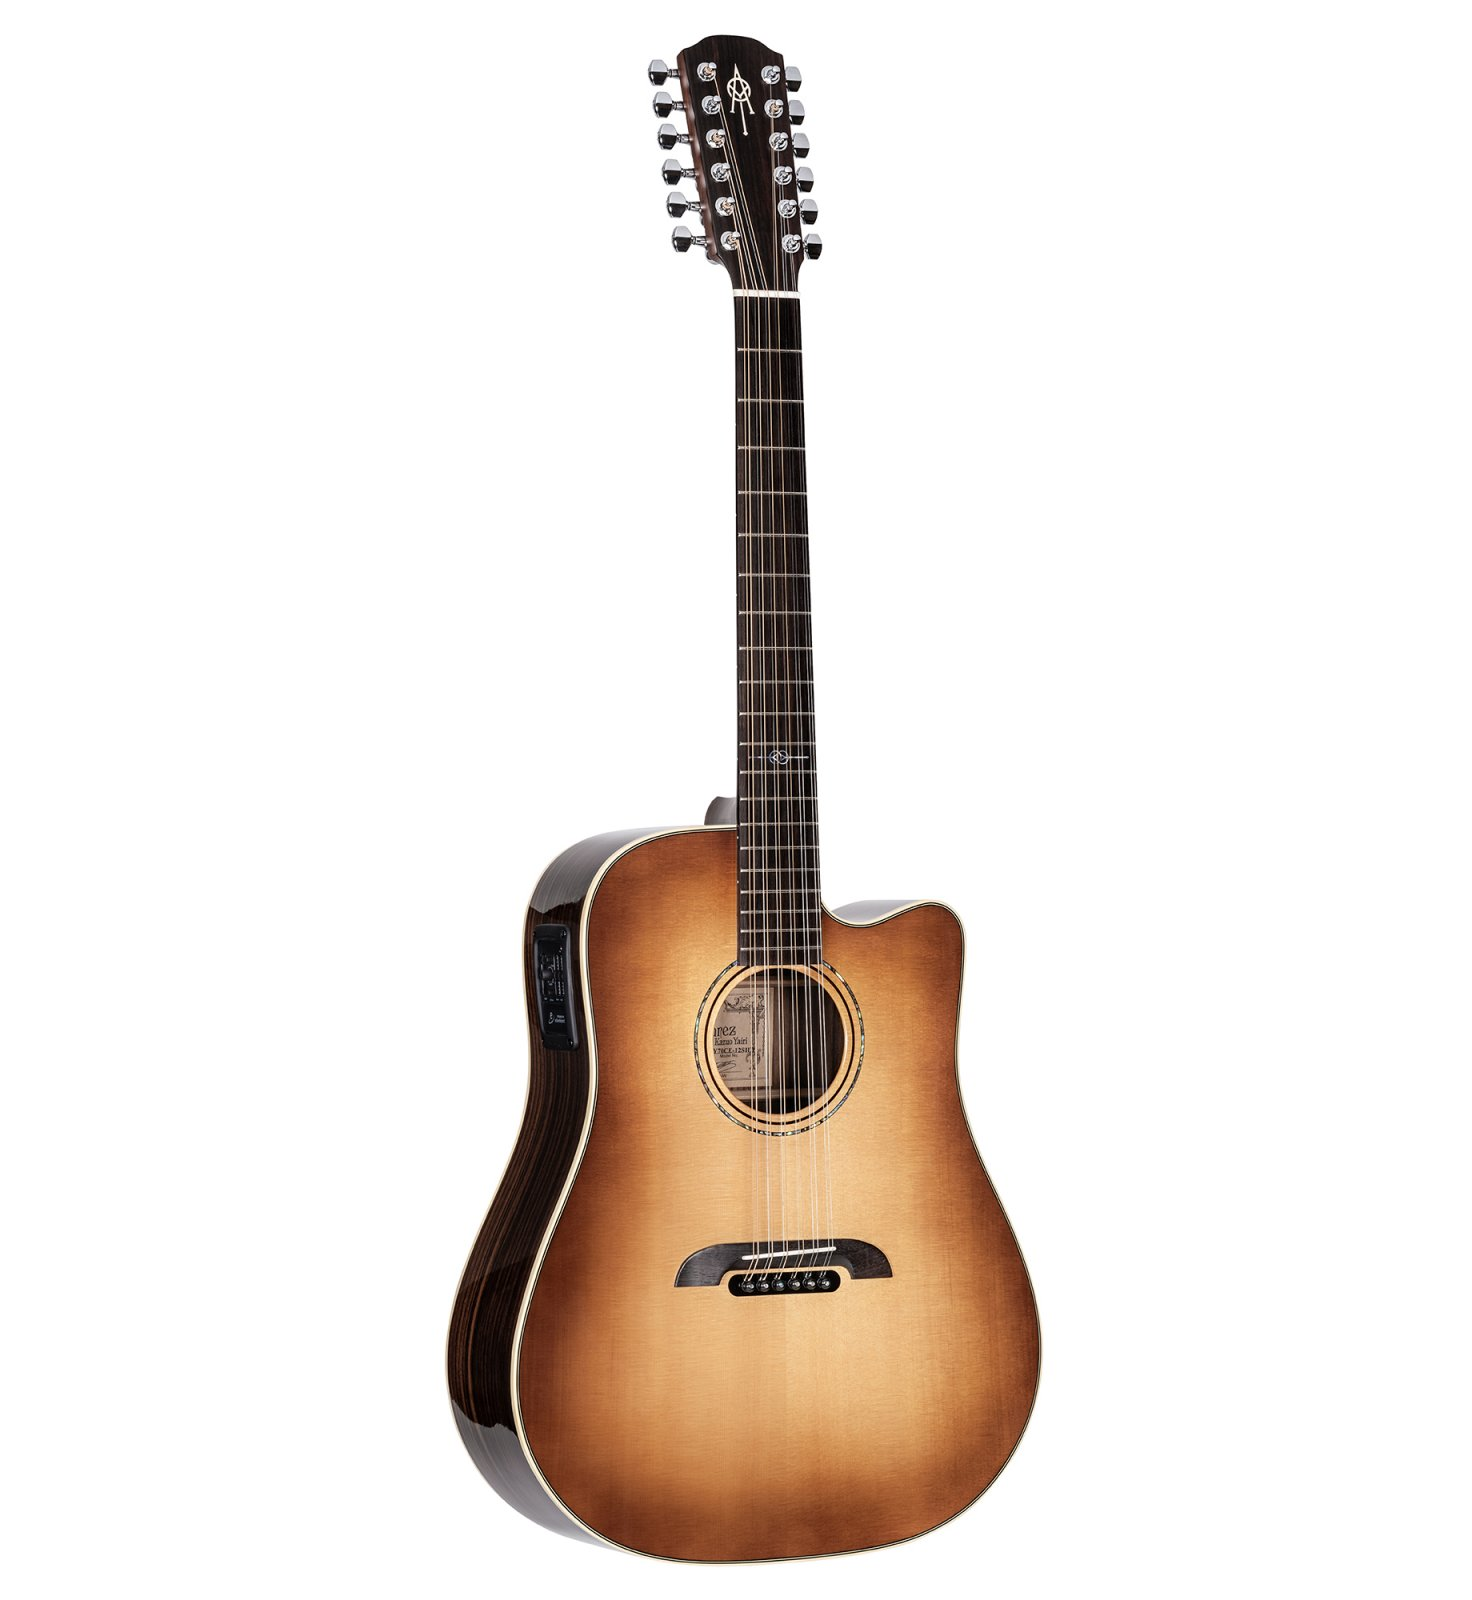 Alvarez-Yairi DY70CE-12SHB Standard 12-String Dreadnought Sitka/Rosewood Acoustic/Electric Guitar